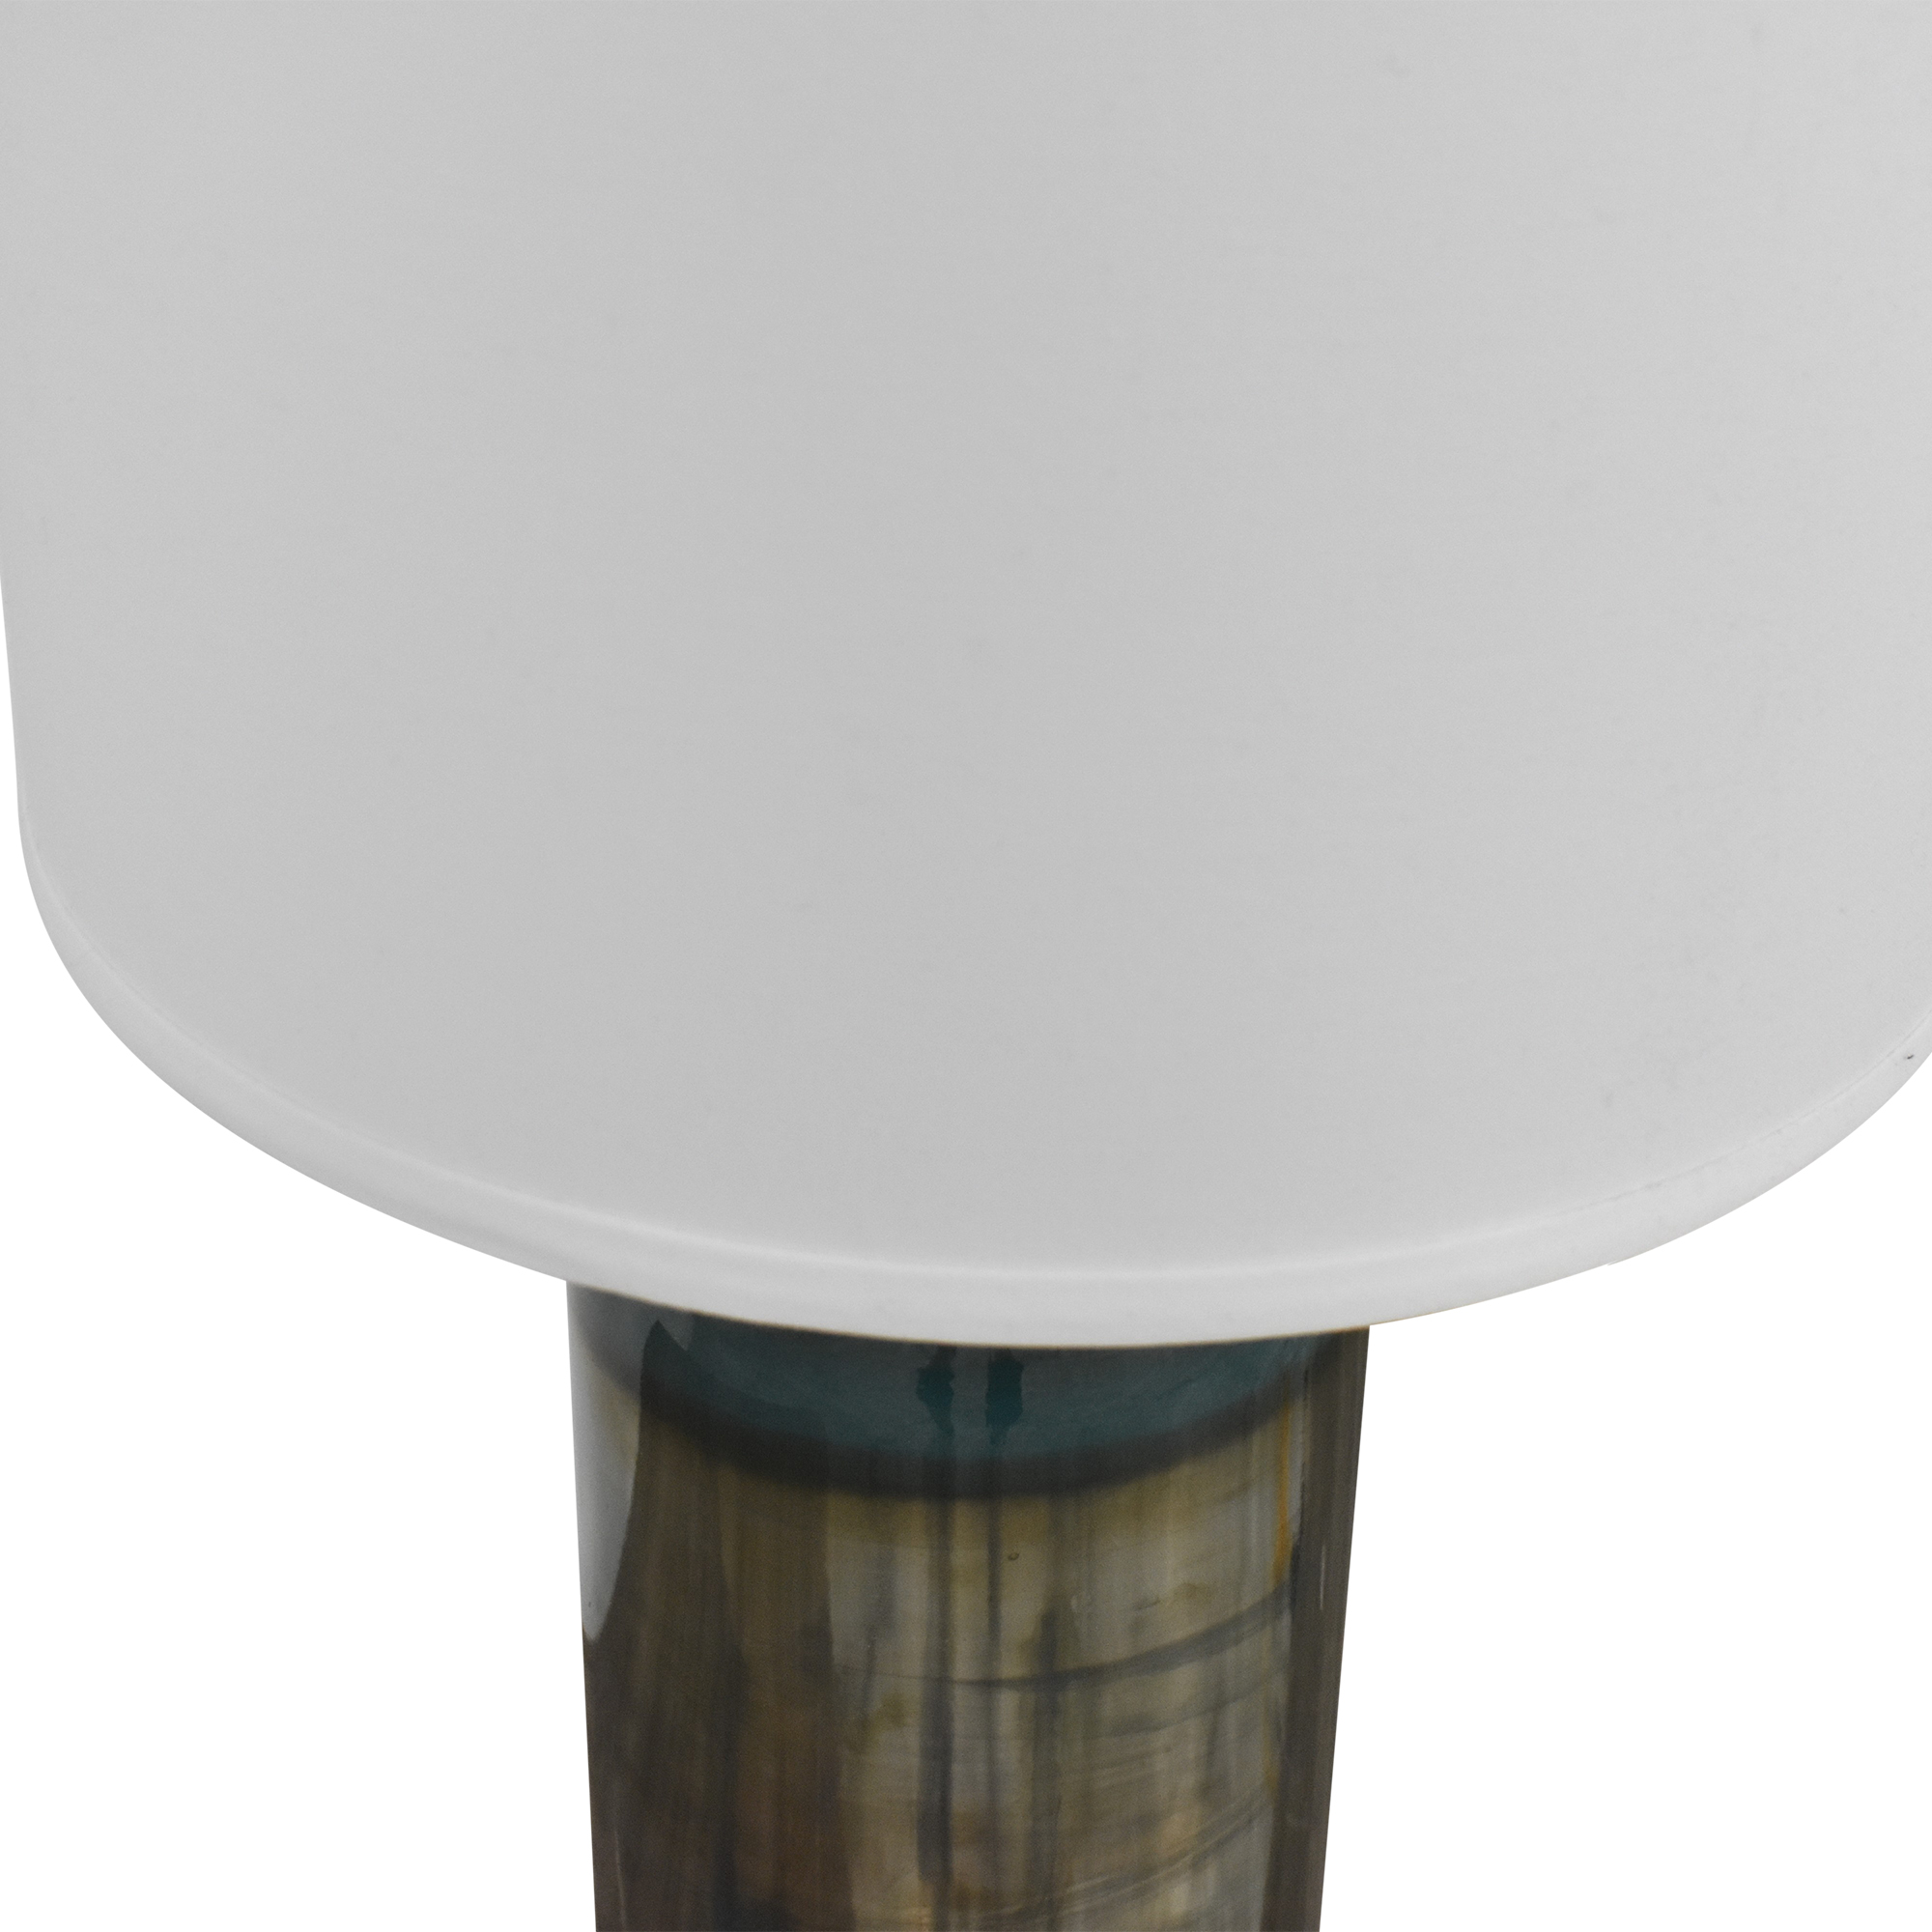 Z Gallerie Z Gallerie Orin Table Lamp